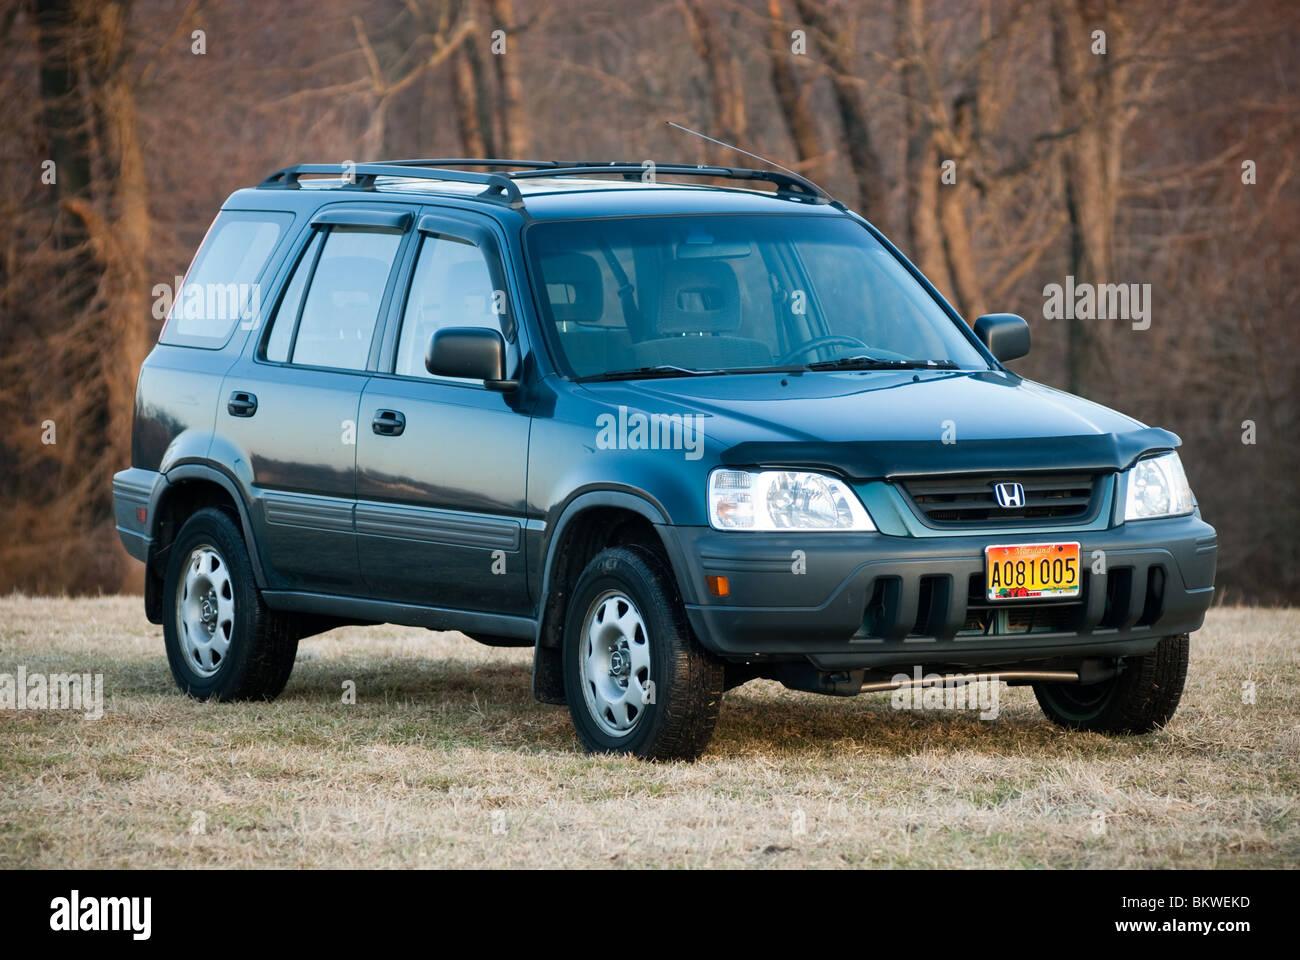 1998 Honda CRV - Stock Image